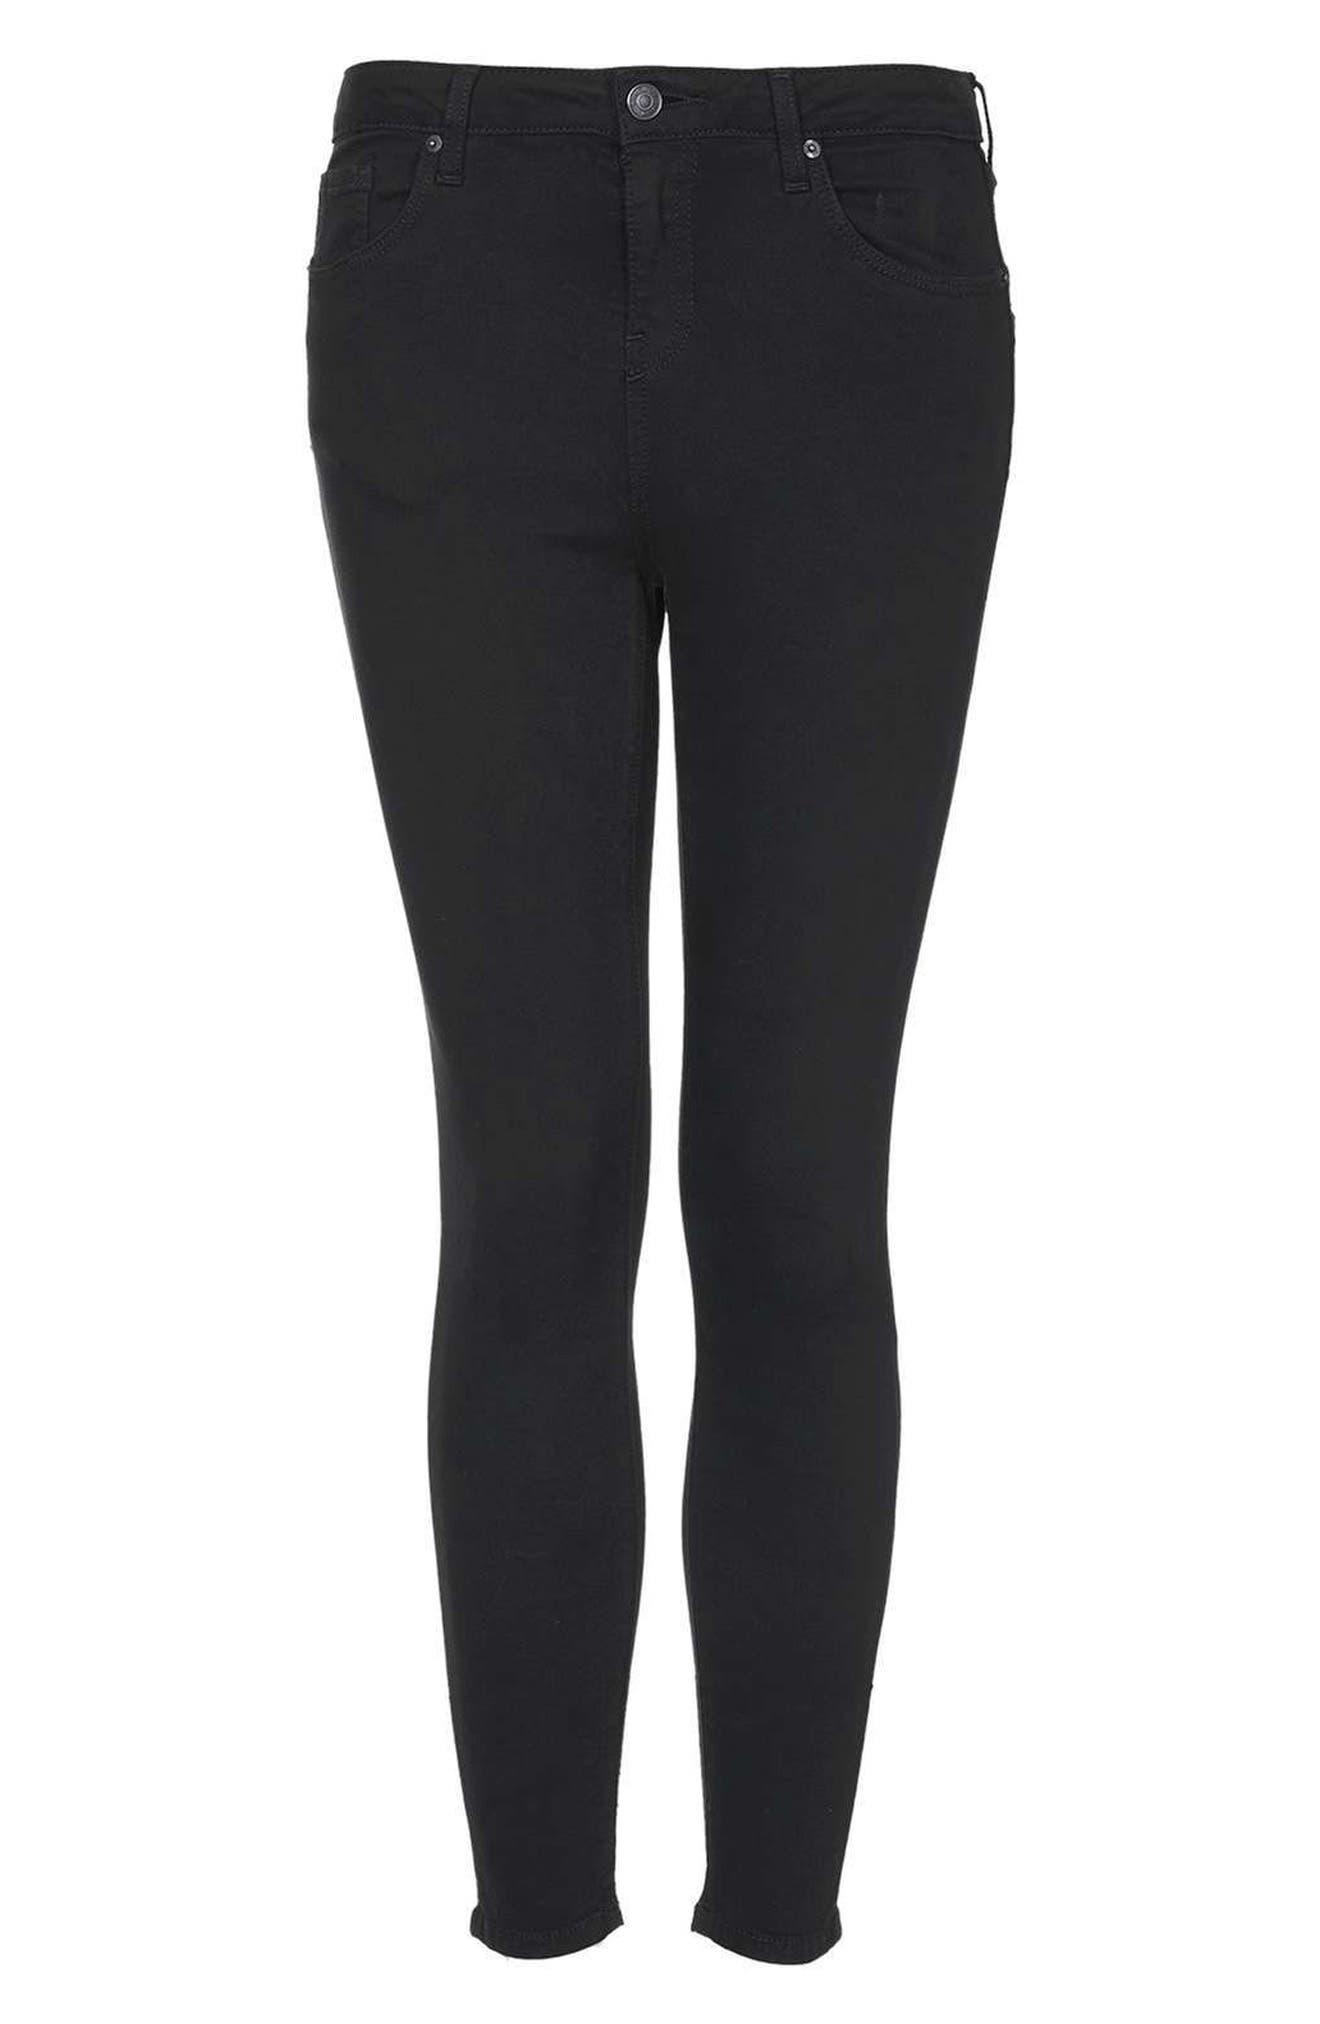 Alternate Image 3  - Topshop Jamie Ankle Skinny Jeans (Petite)